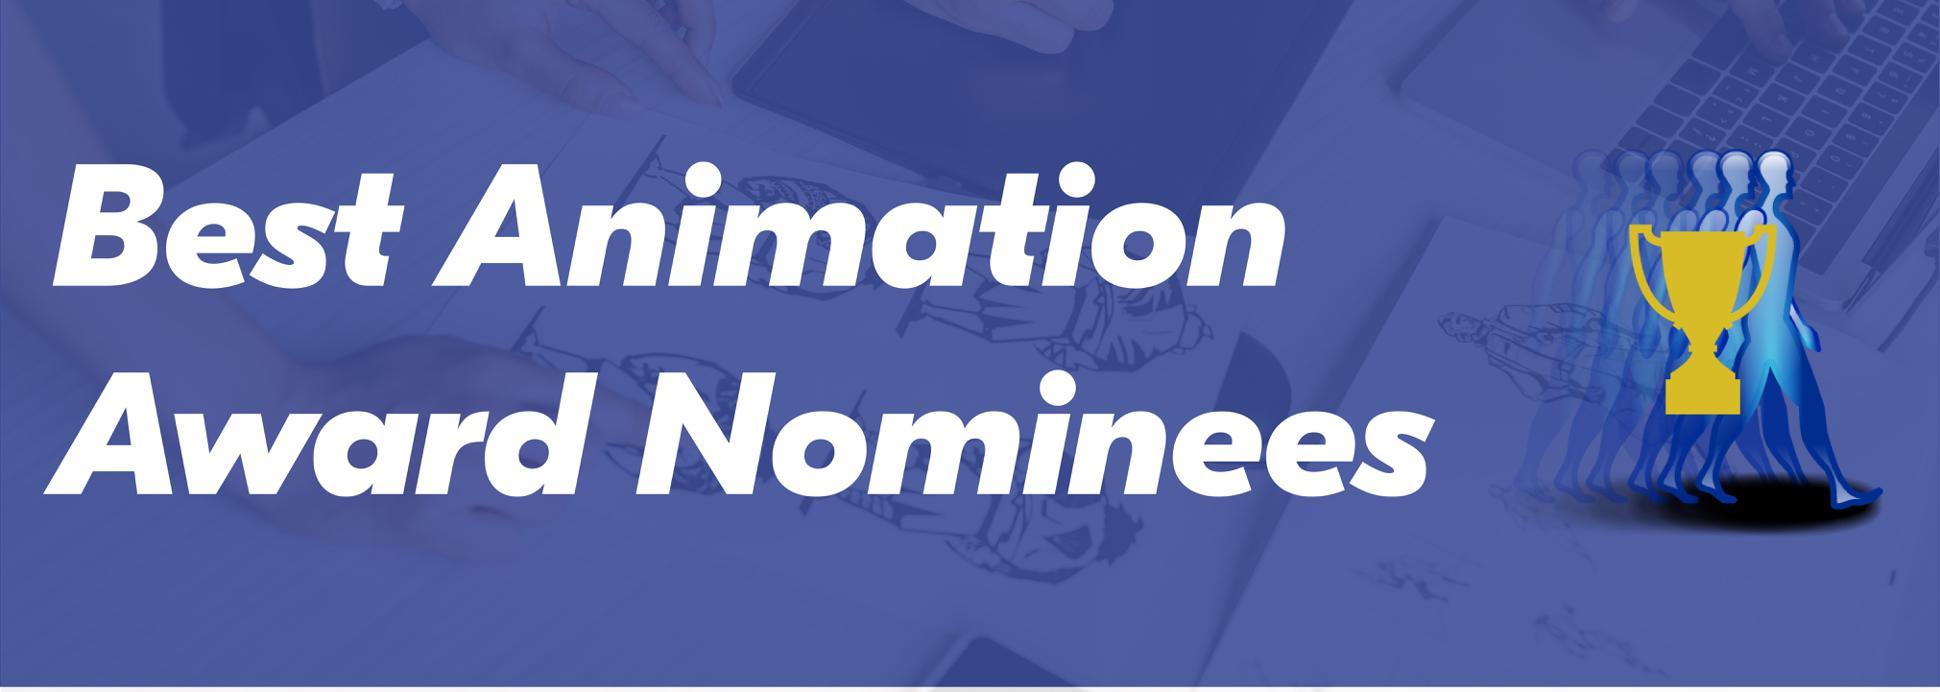 Best Animation